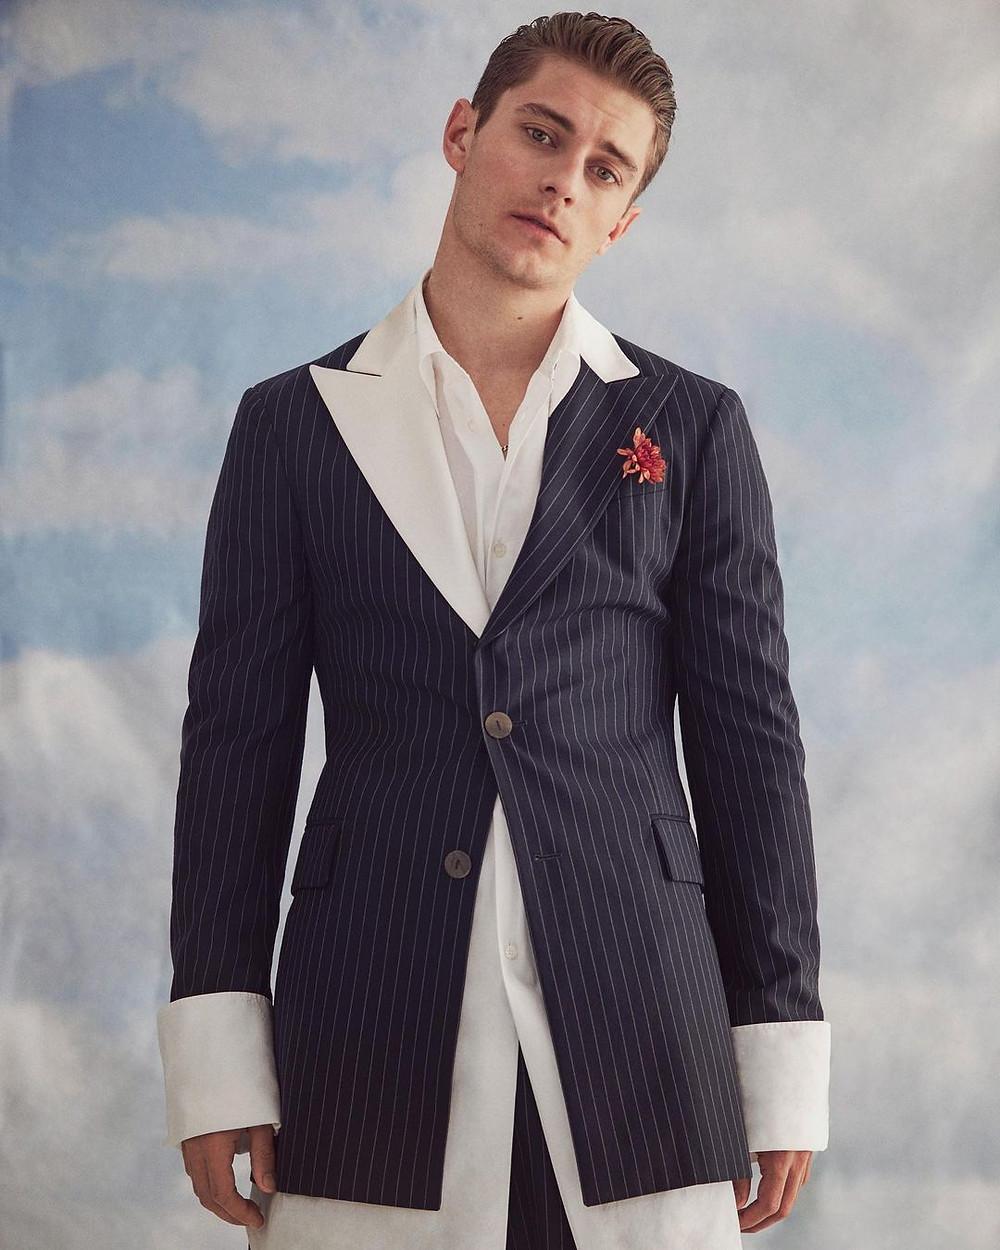 Jakub como modelo para Esquire Magazine España (Cortesía)